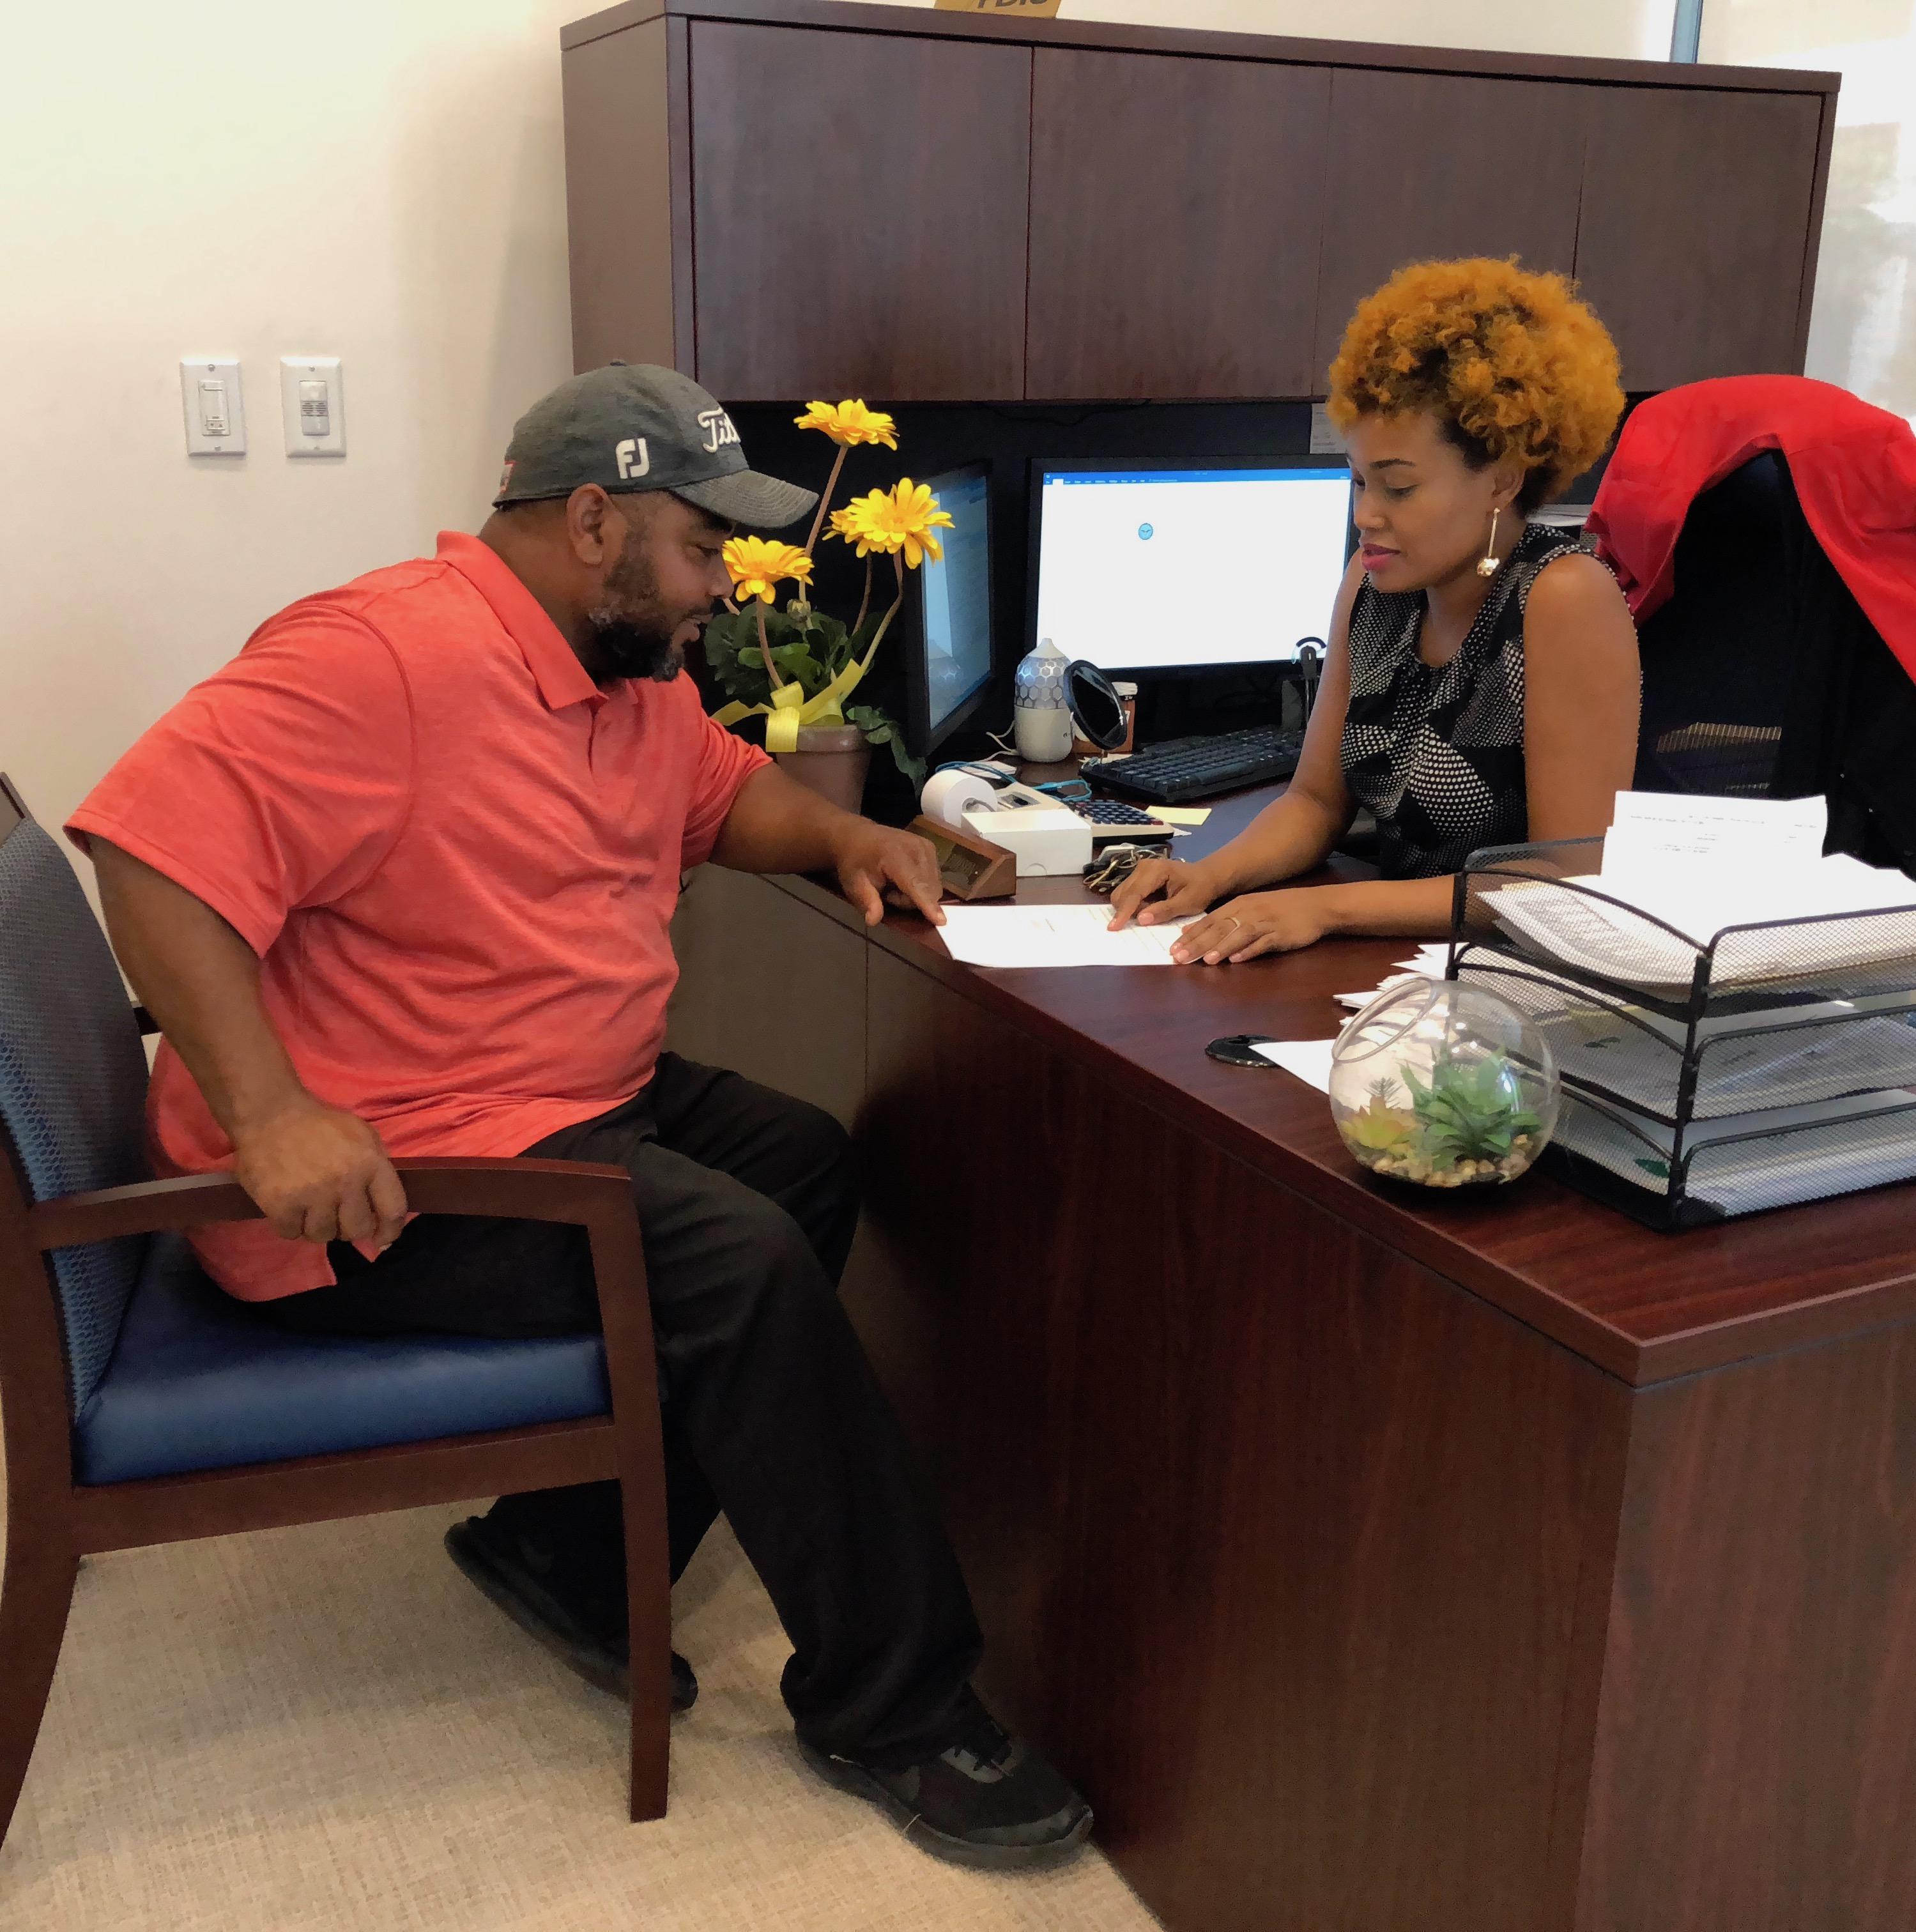 Optus Customer with Optus employee explaining loan documents